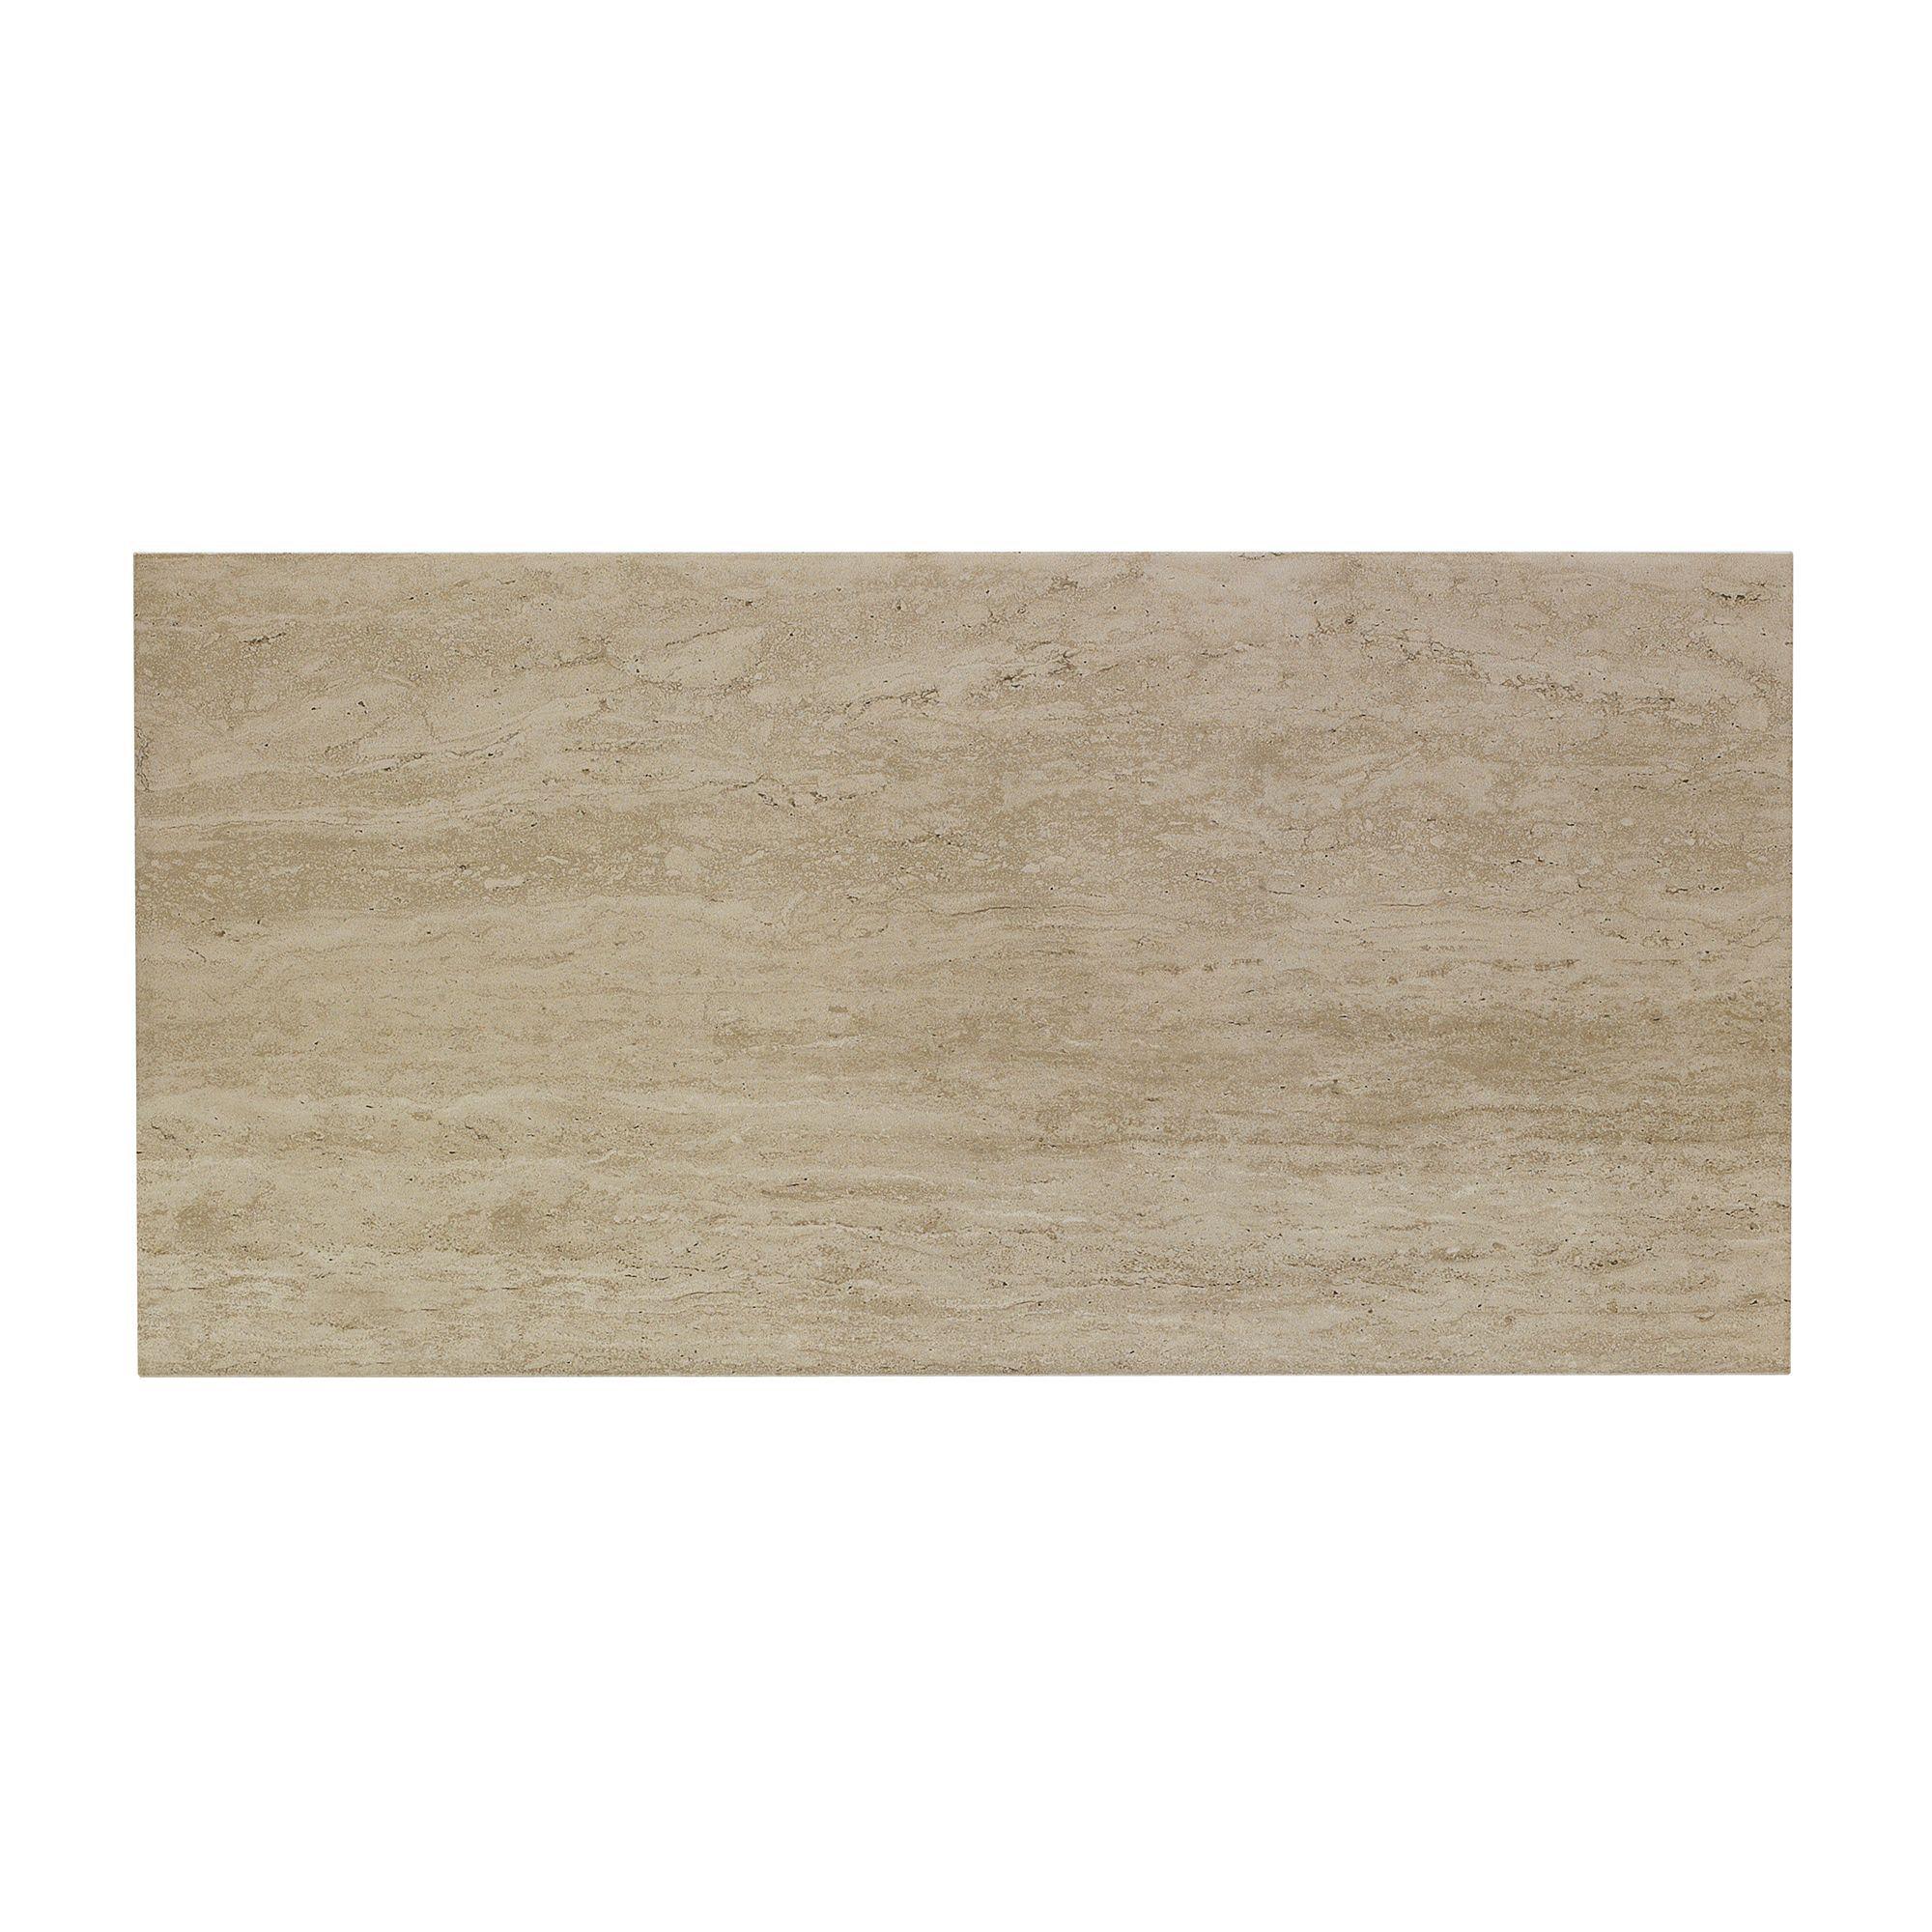 Origin Sand Stone Effect Linear Travertine Ceramic Wall: Origin Sand Linear Travertine Ceramic Wall Tile, Pack Of 8